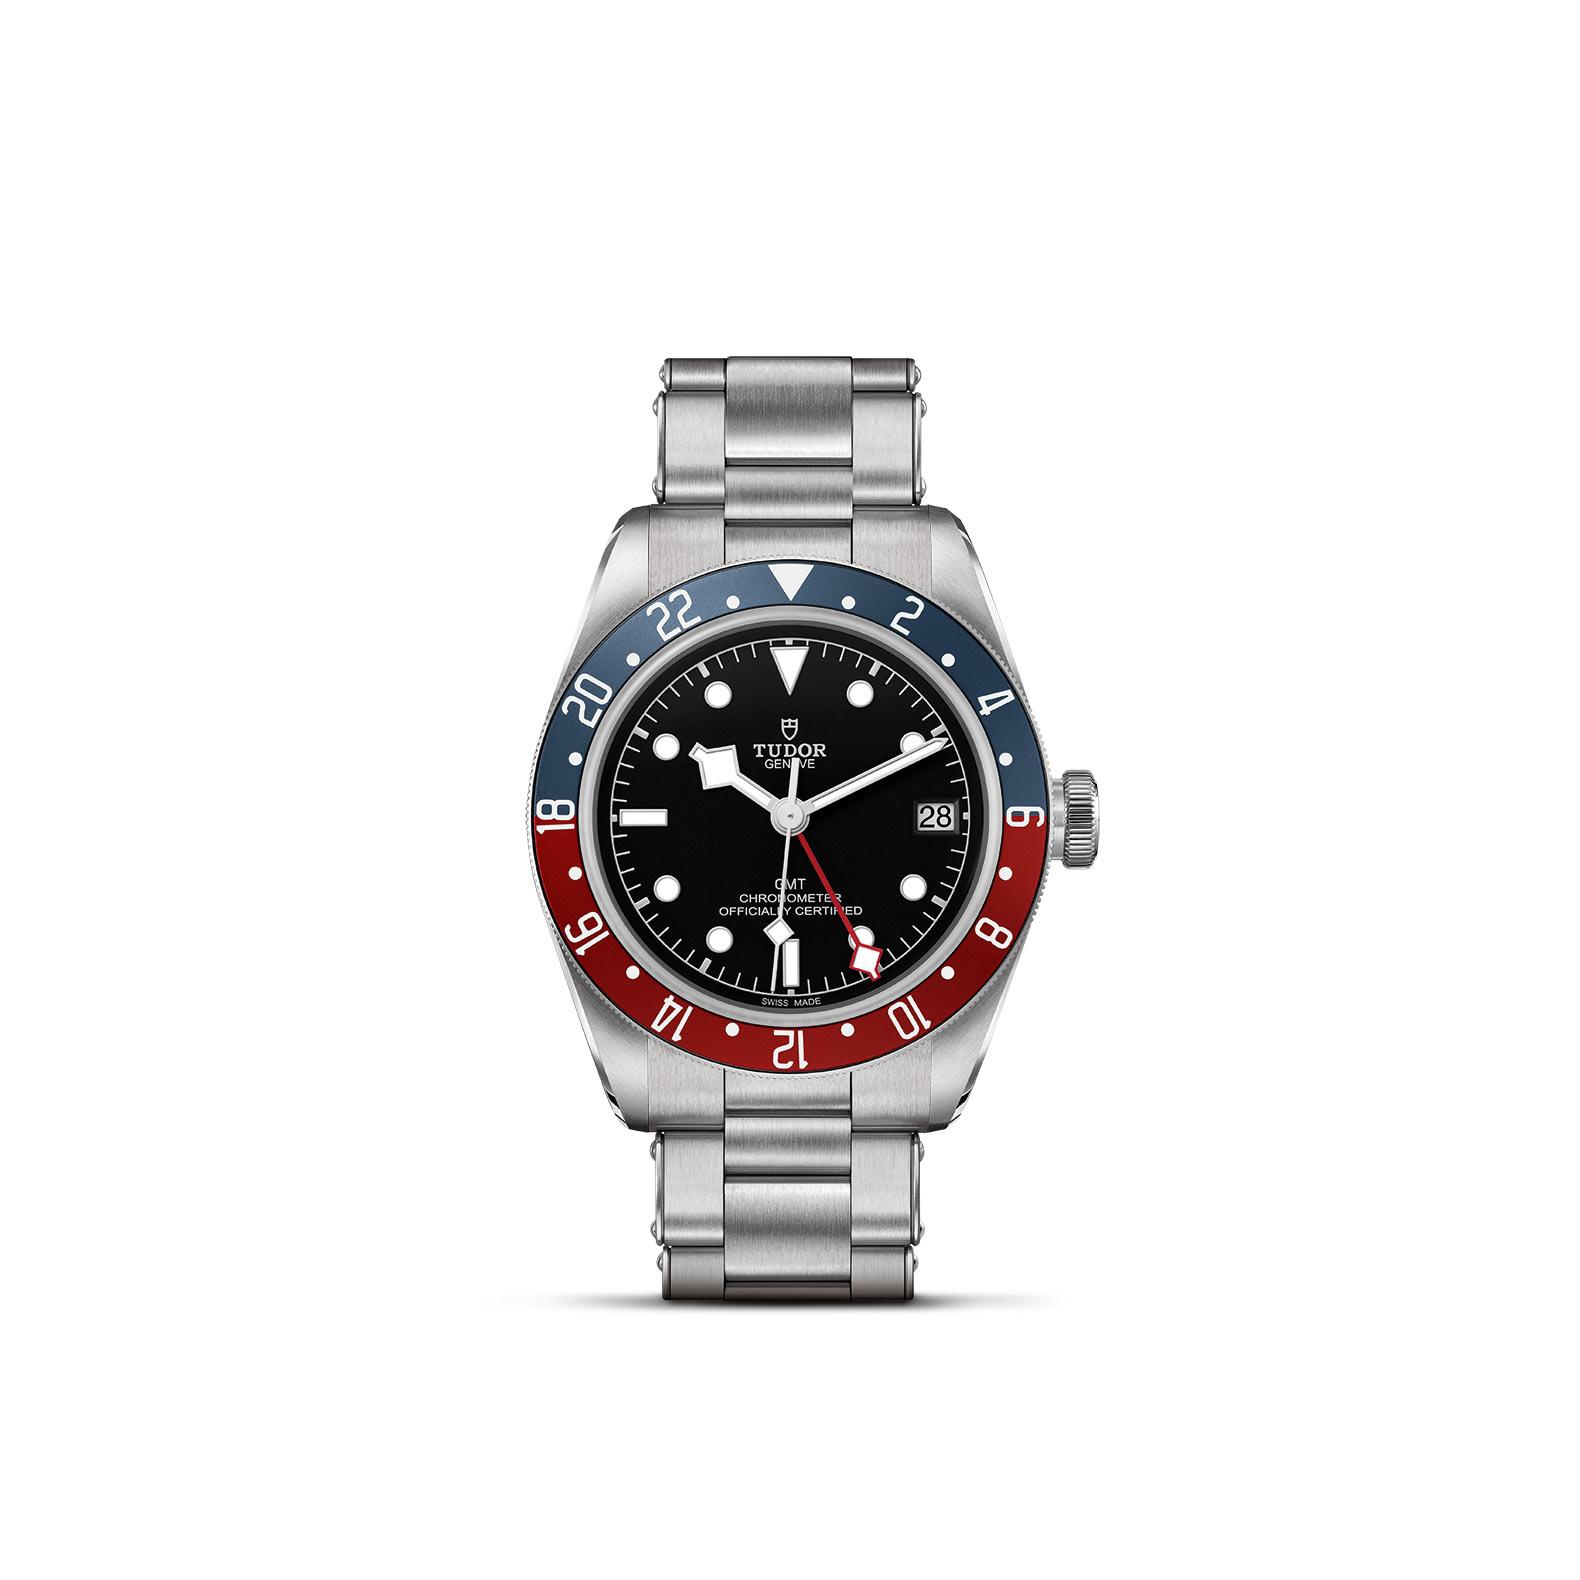 TUDOR Black Bay GMT M79830RB 0001 Upright